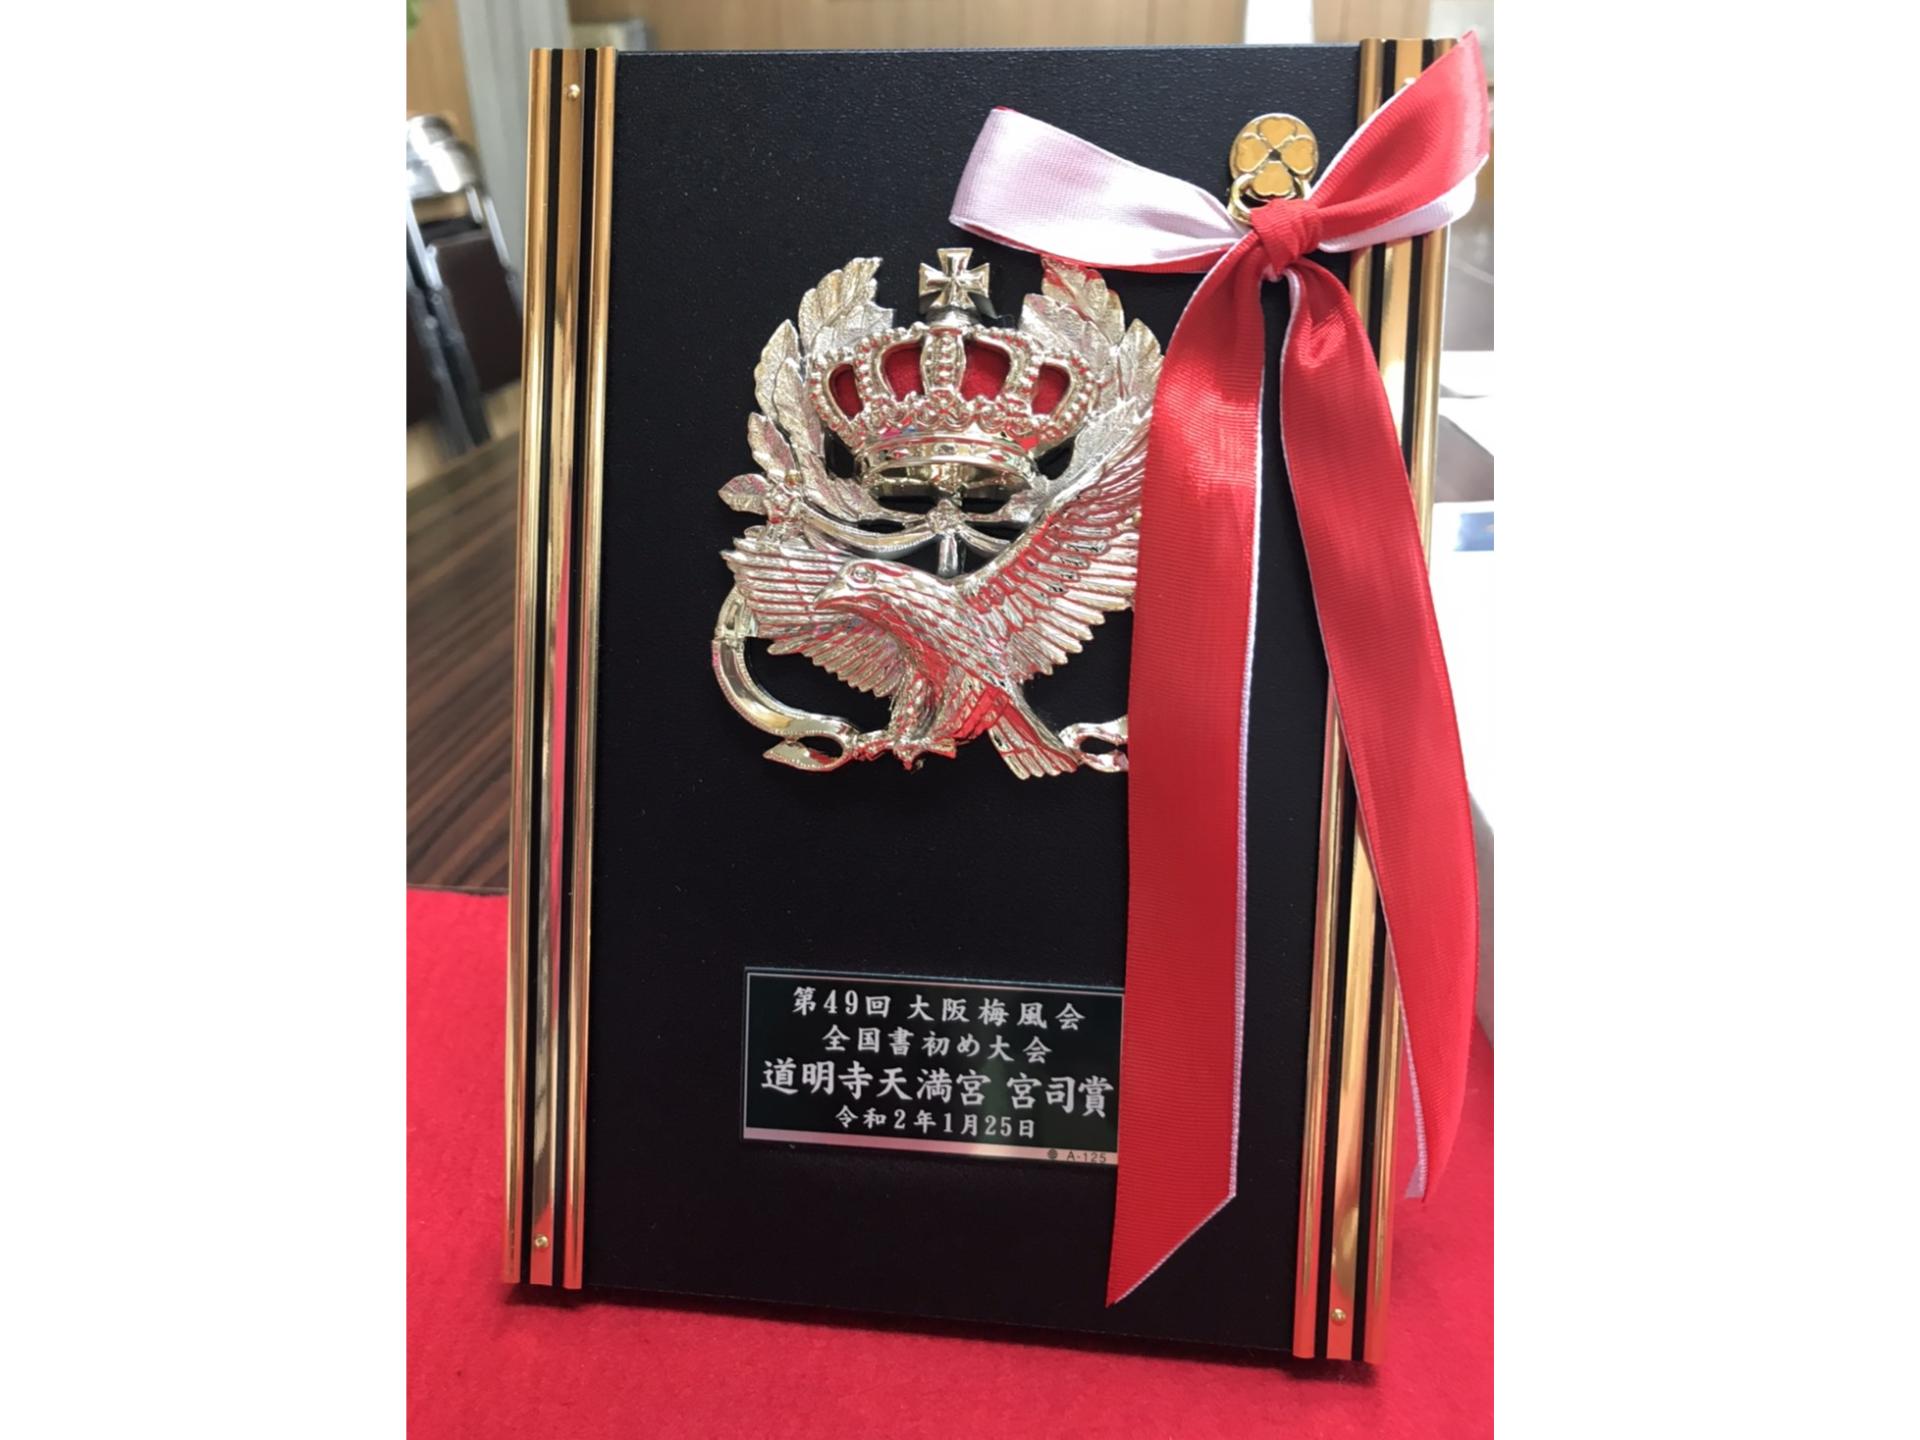 全国書初め大会 賞